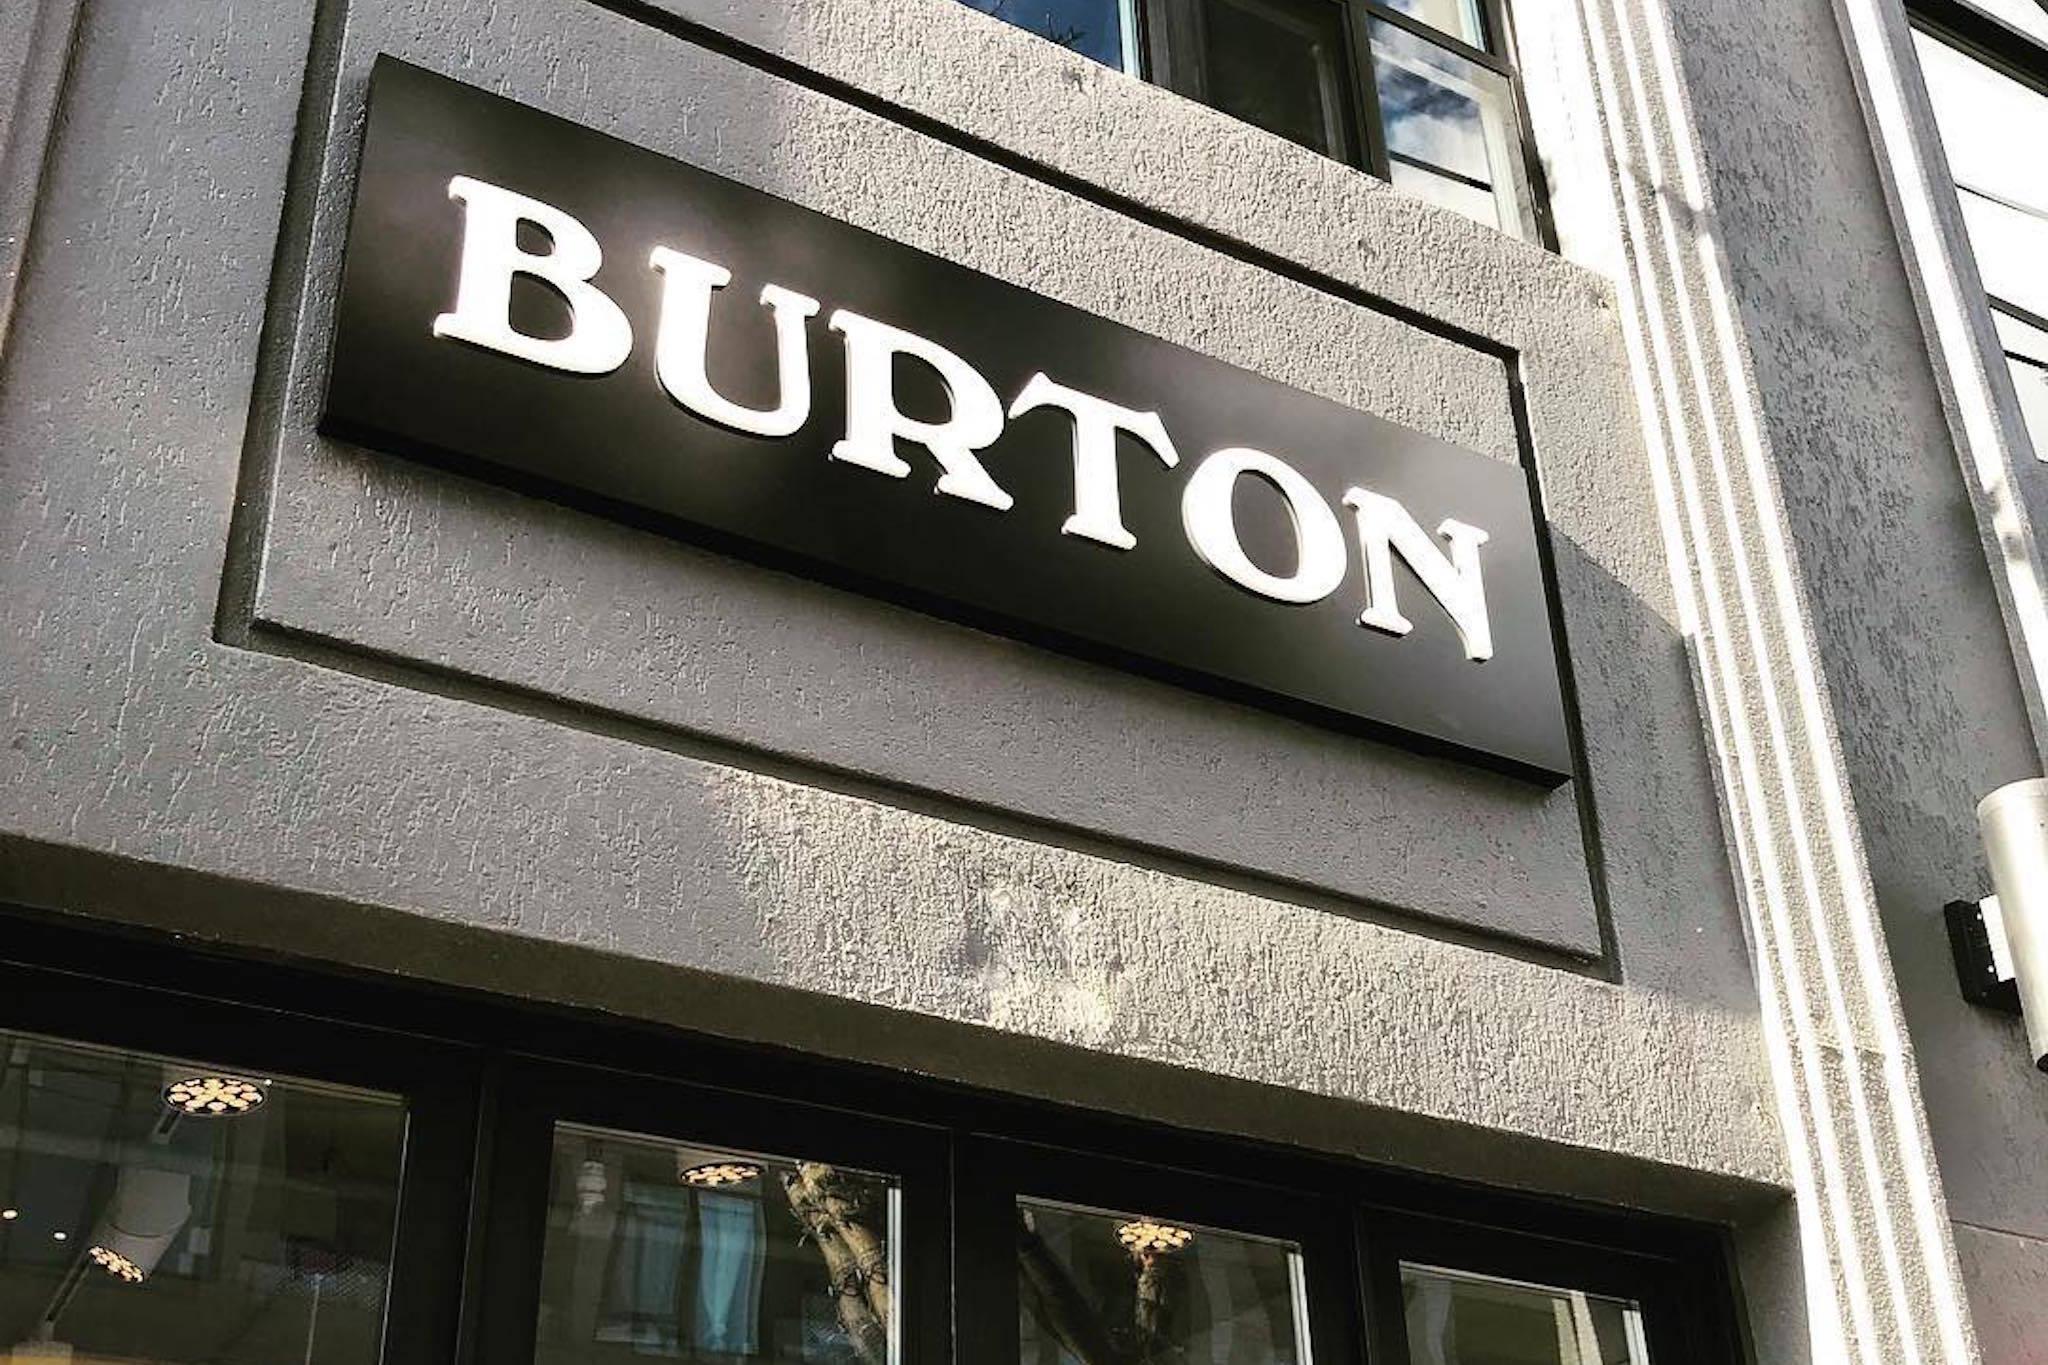 Burton Toronto